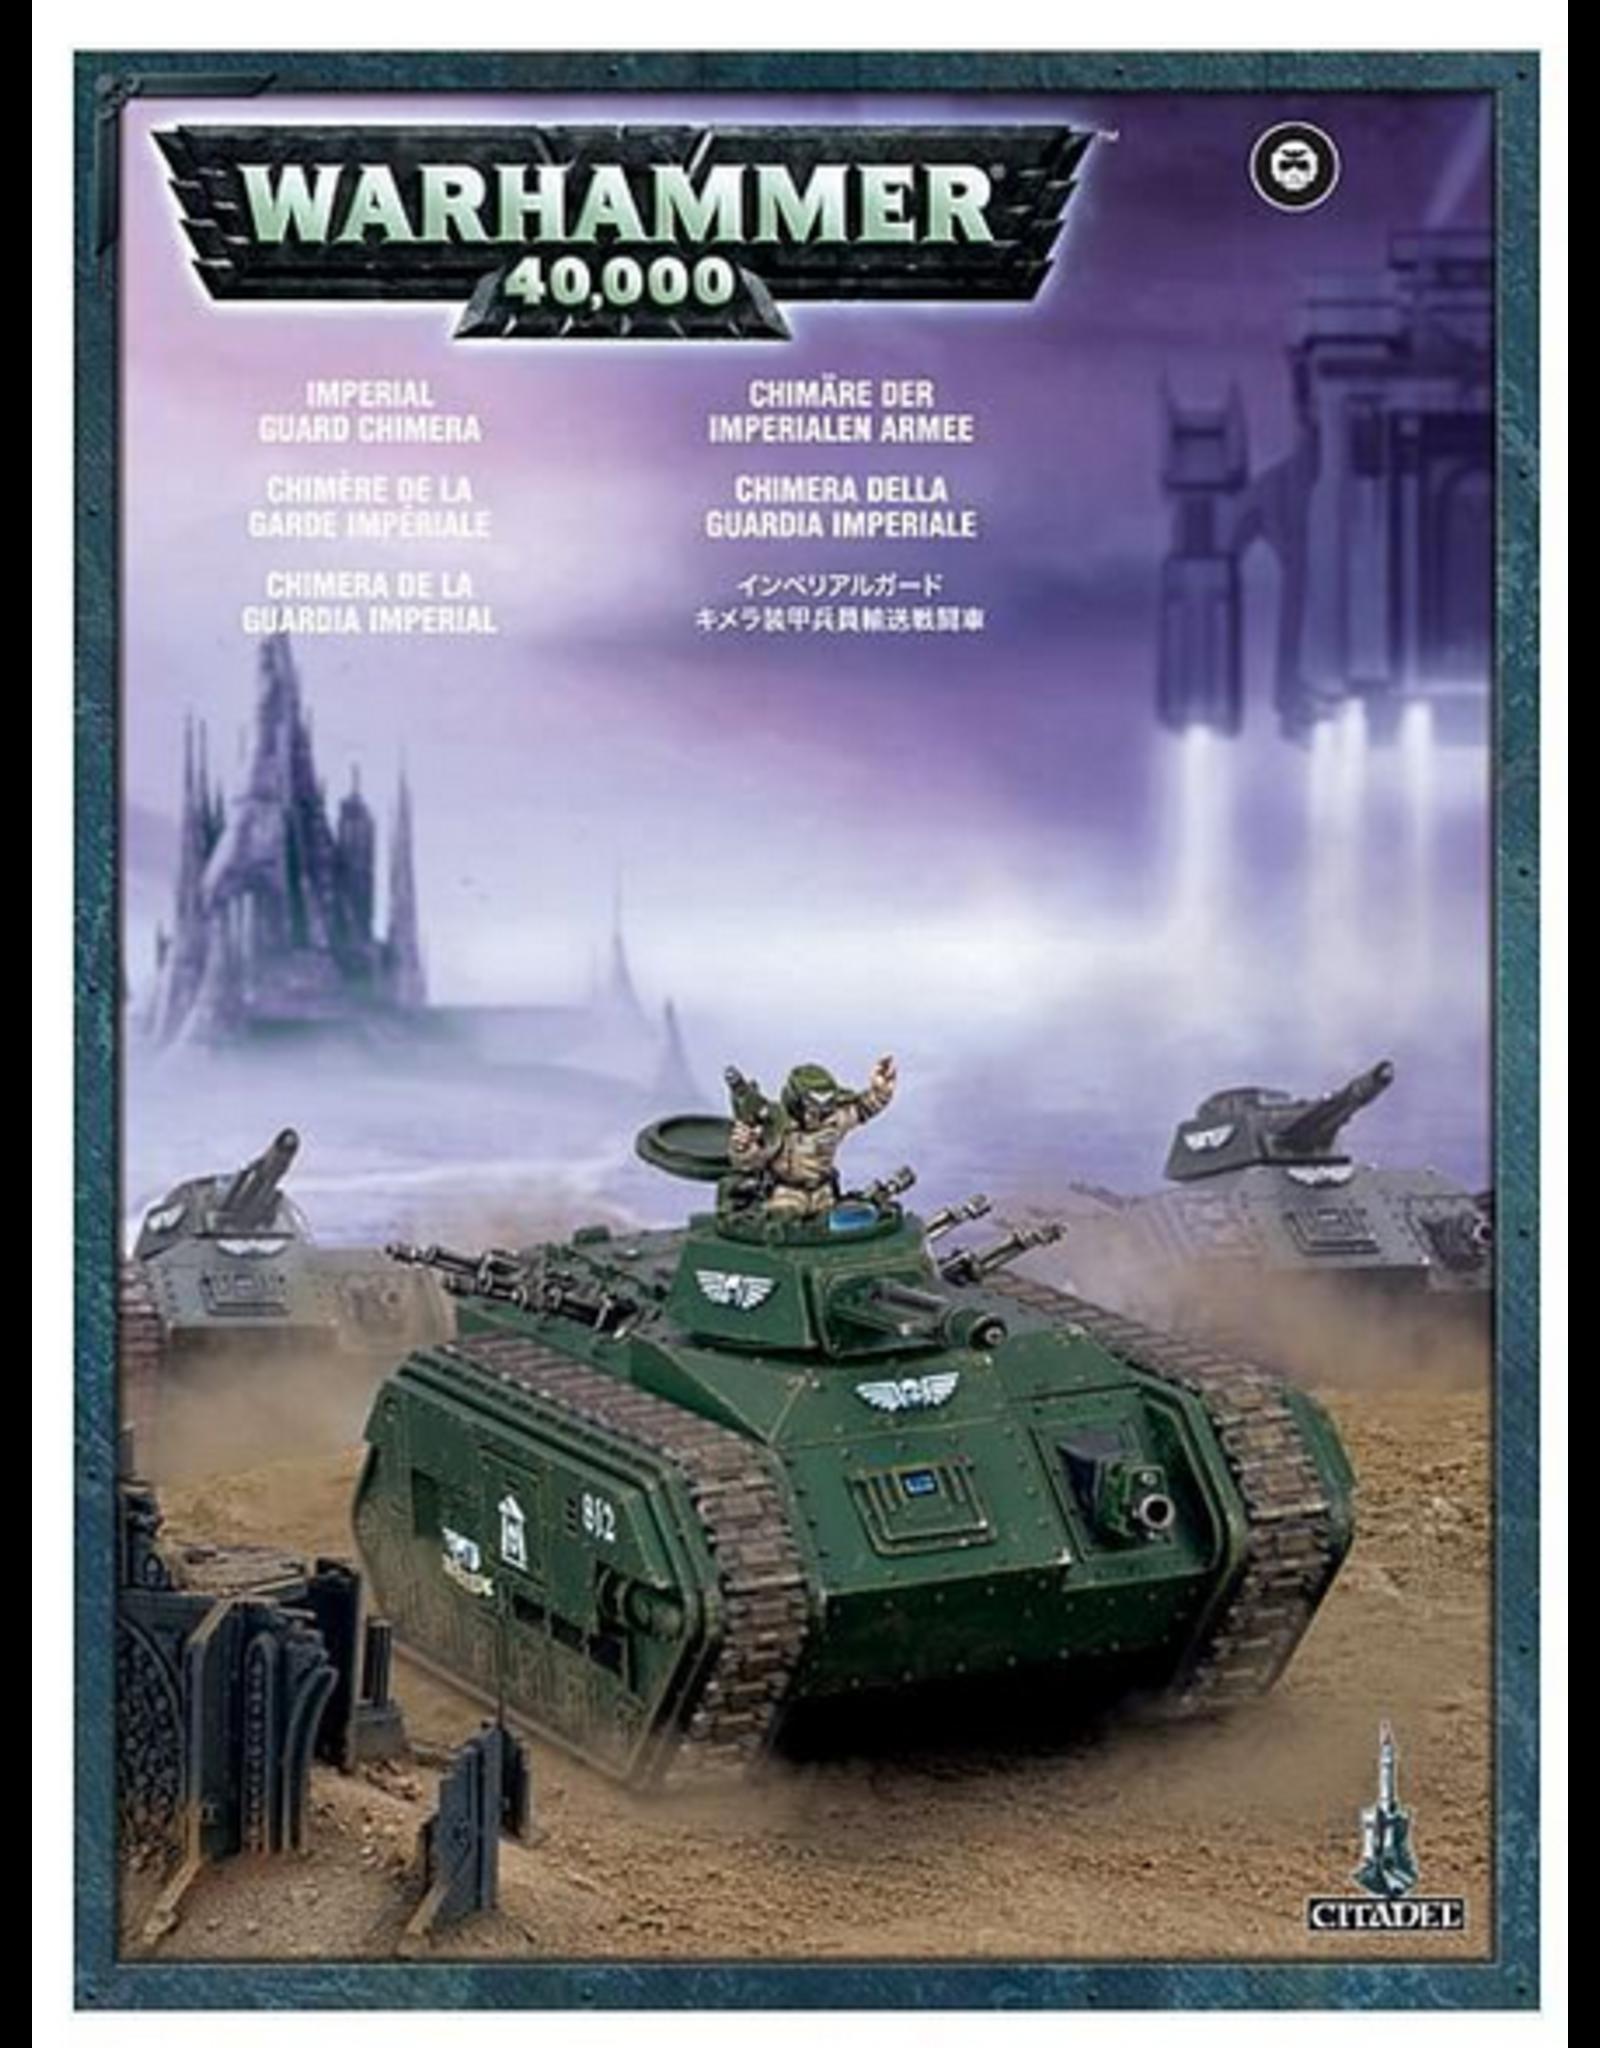 Imperial Guard Chimera (40K)